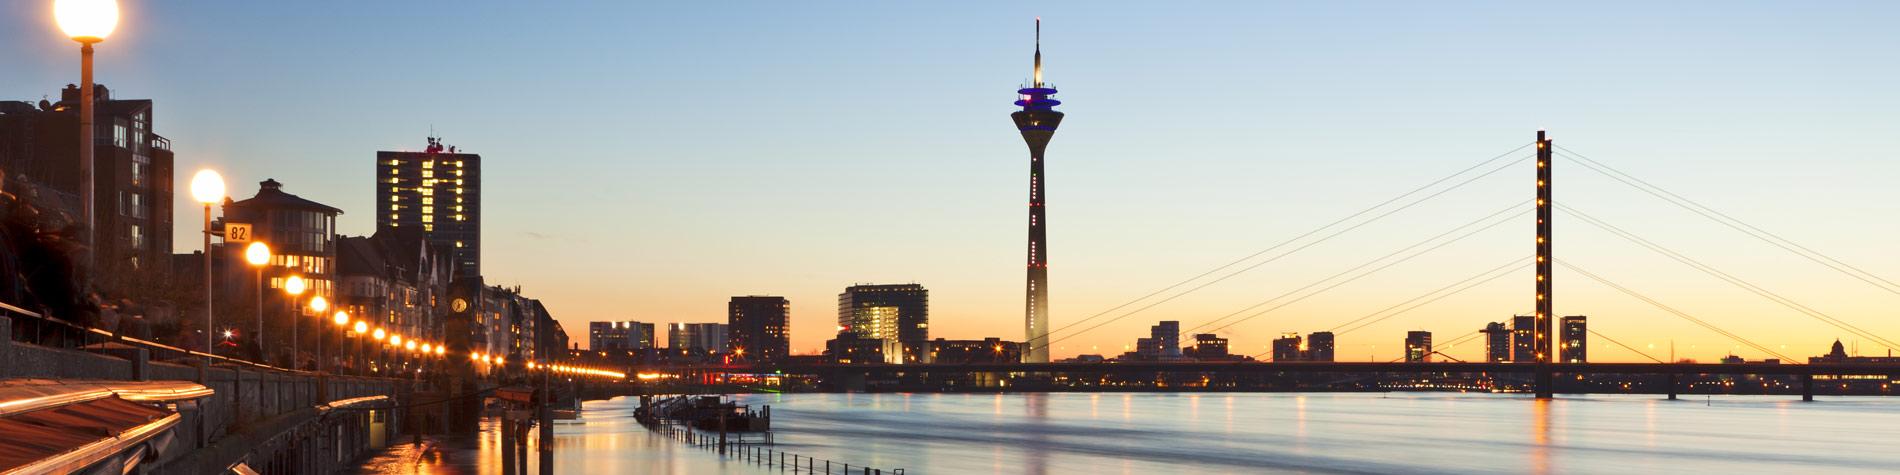 Günstige Flüge Nach Düsseldorf Ryanaircom